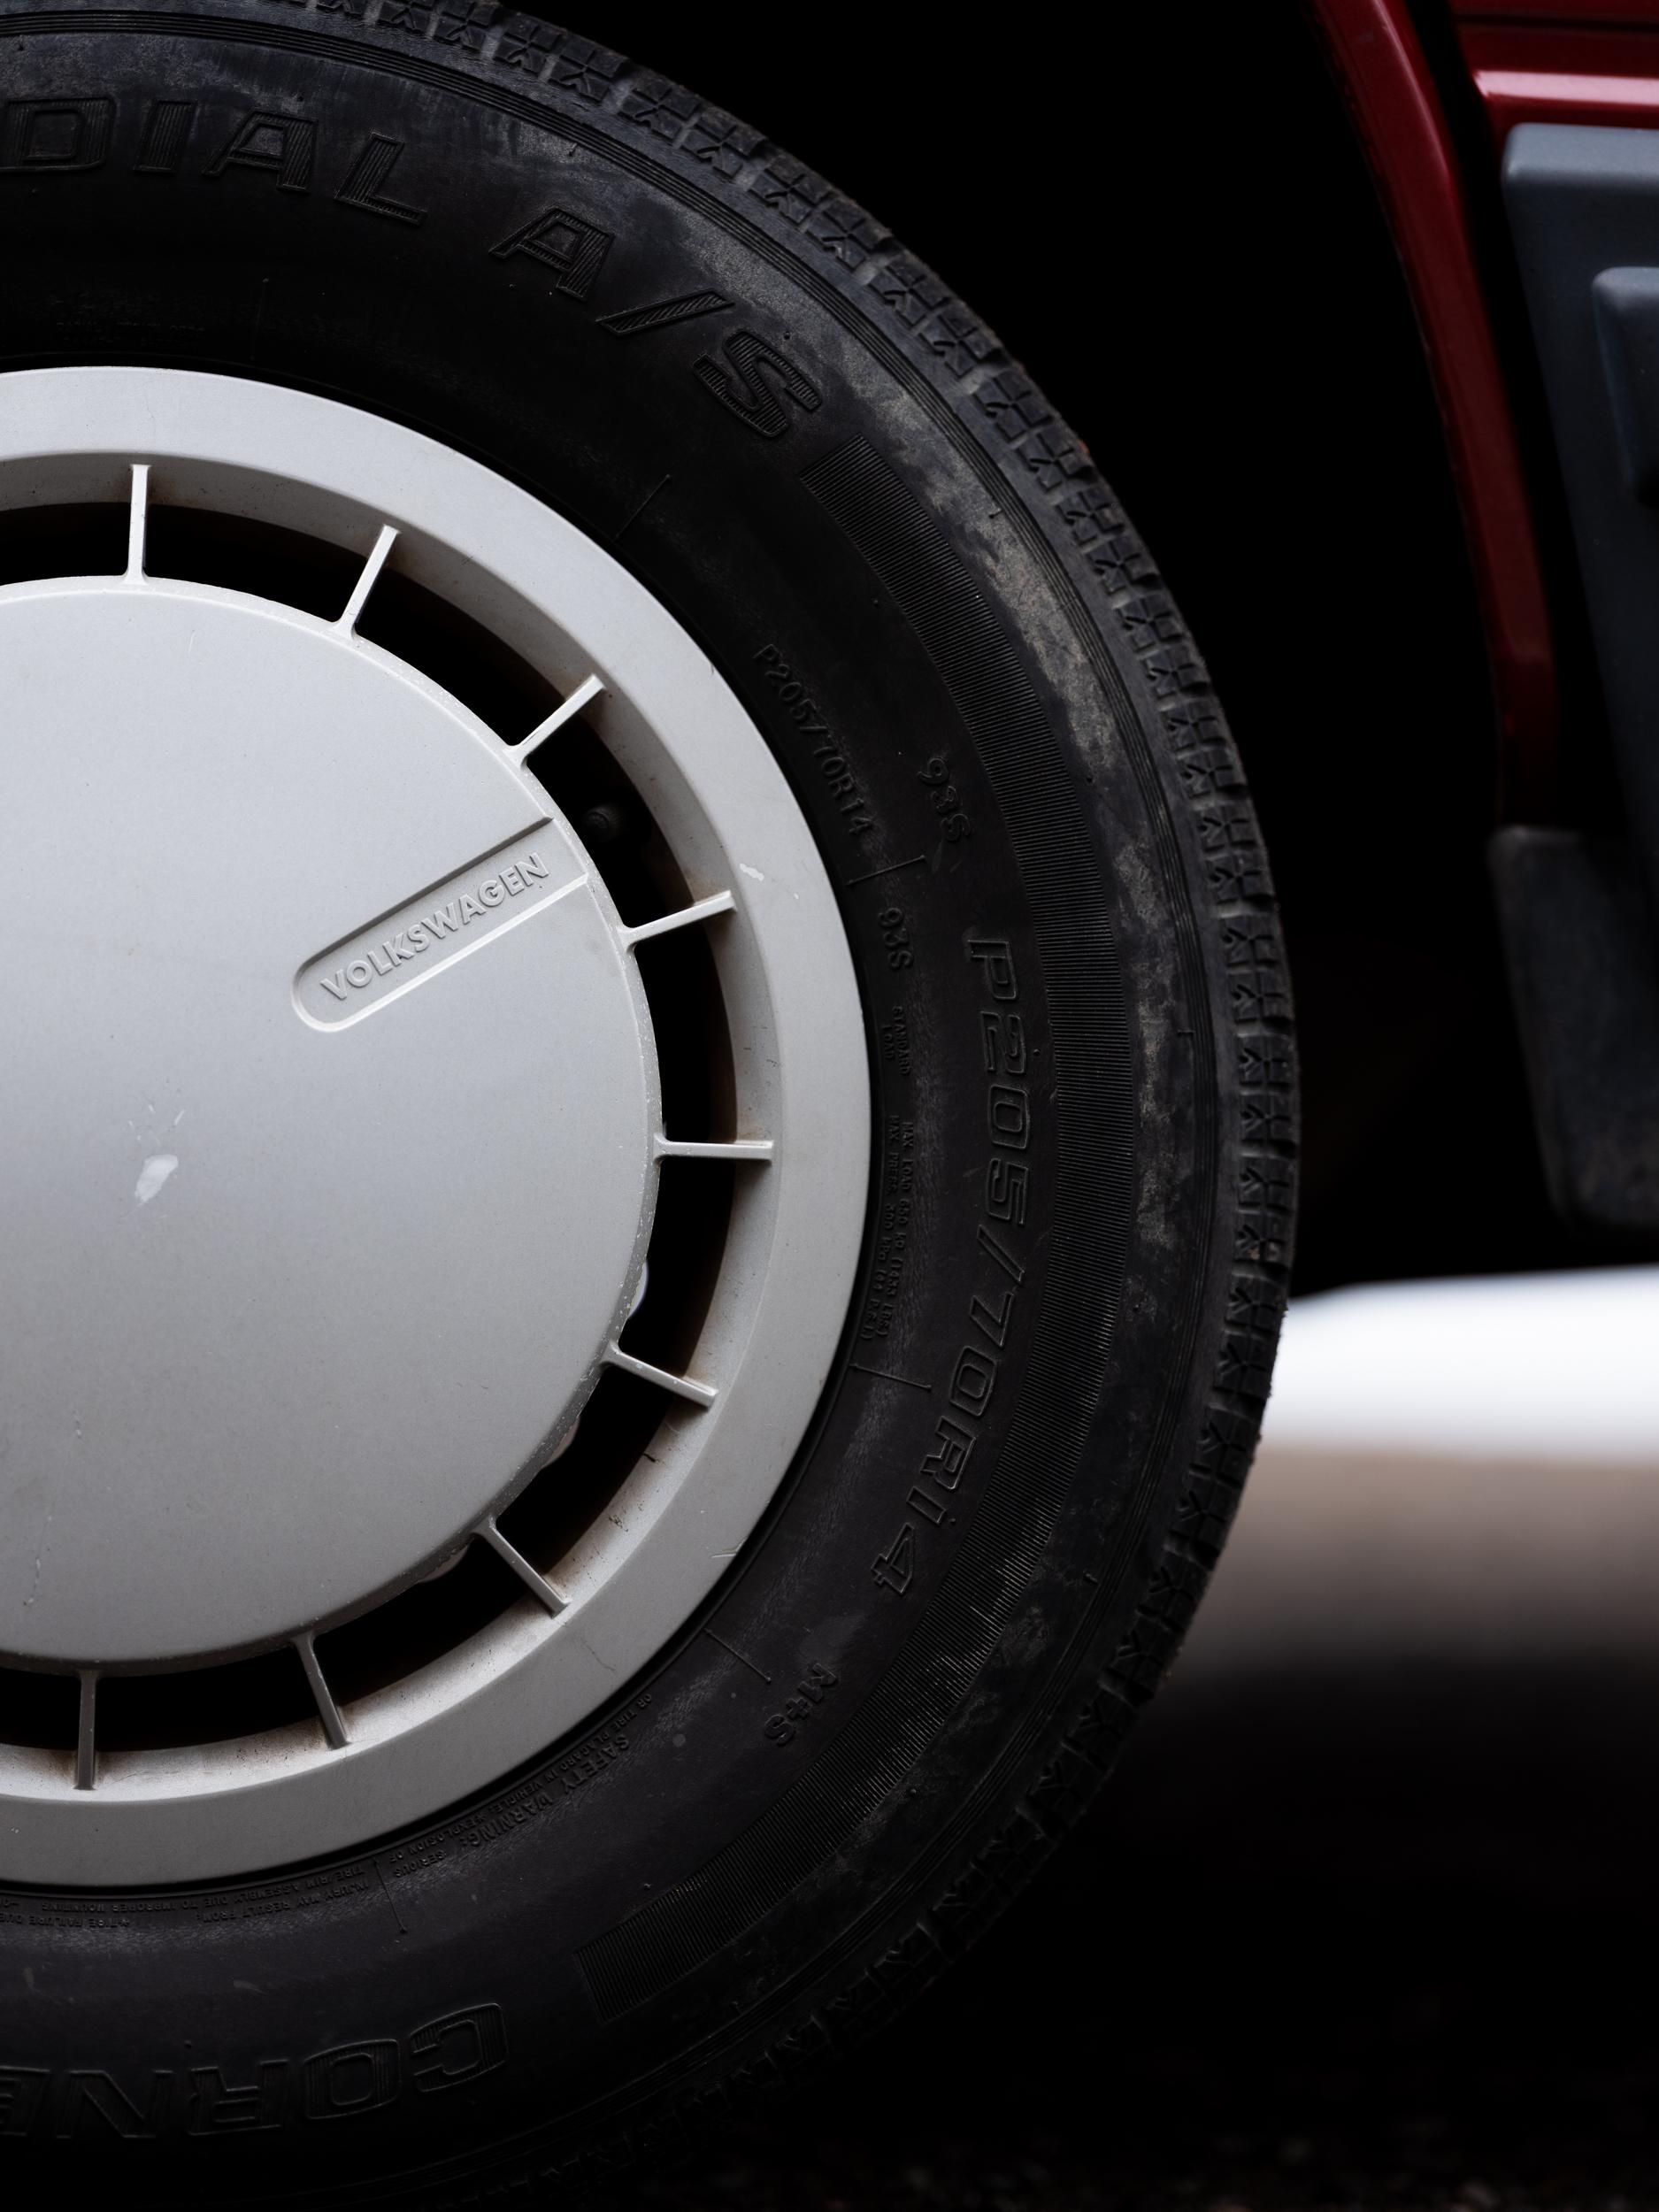 Westfalia_van tire_logo.jpg